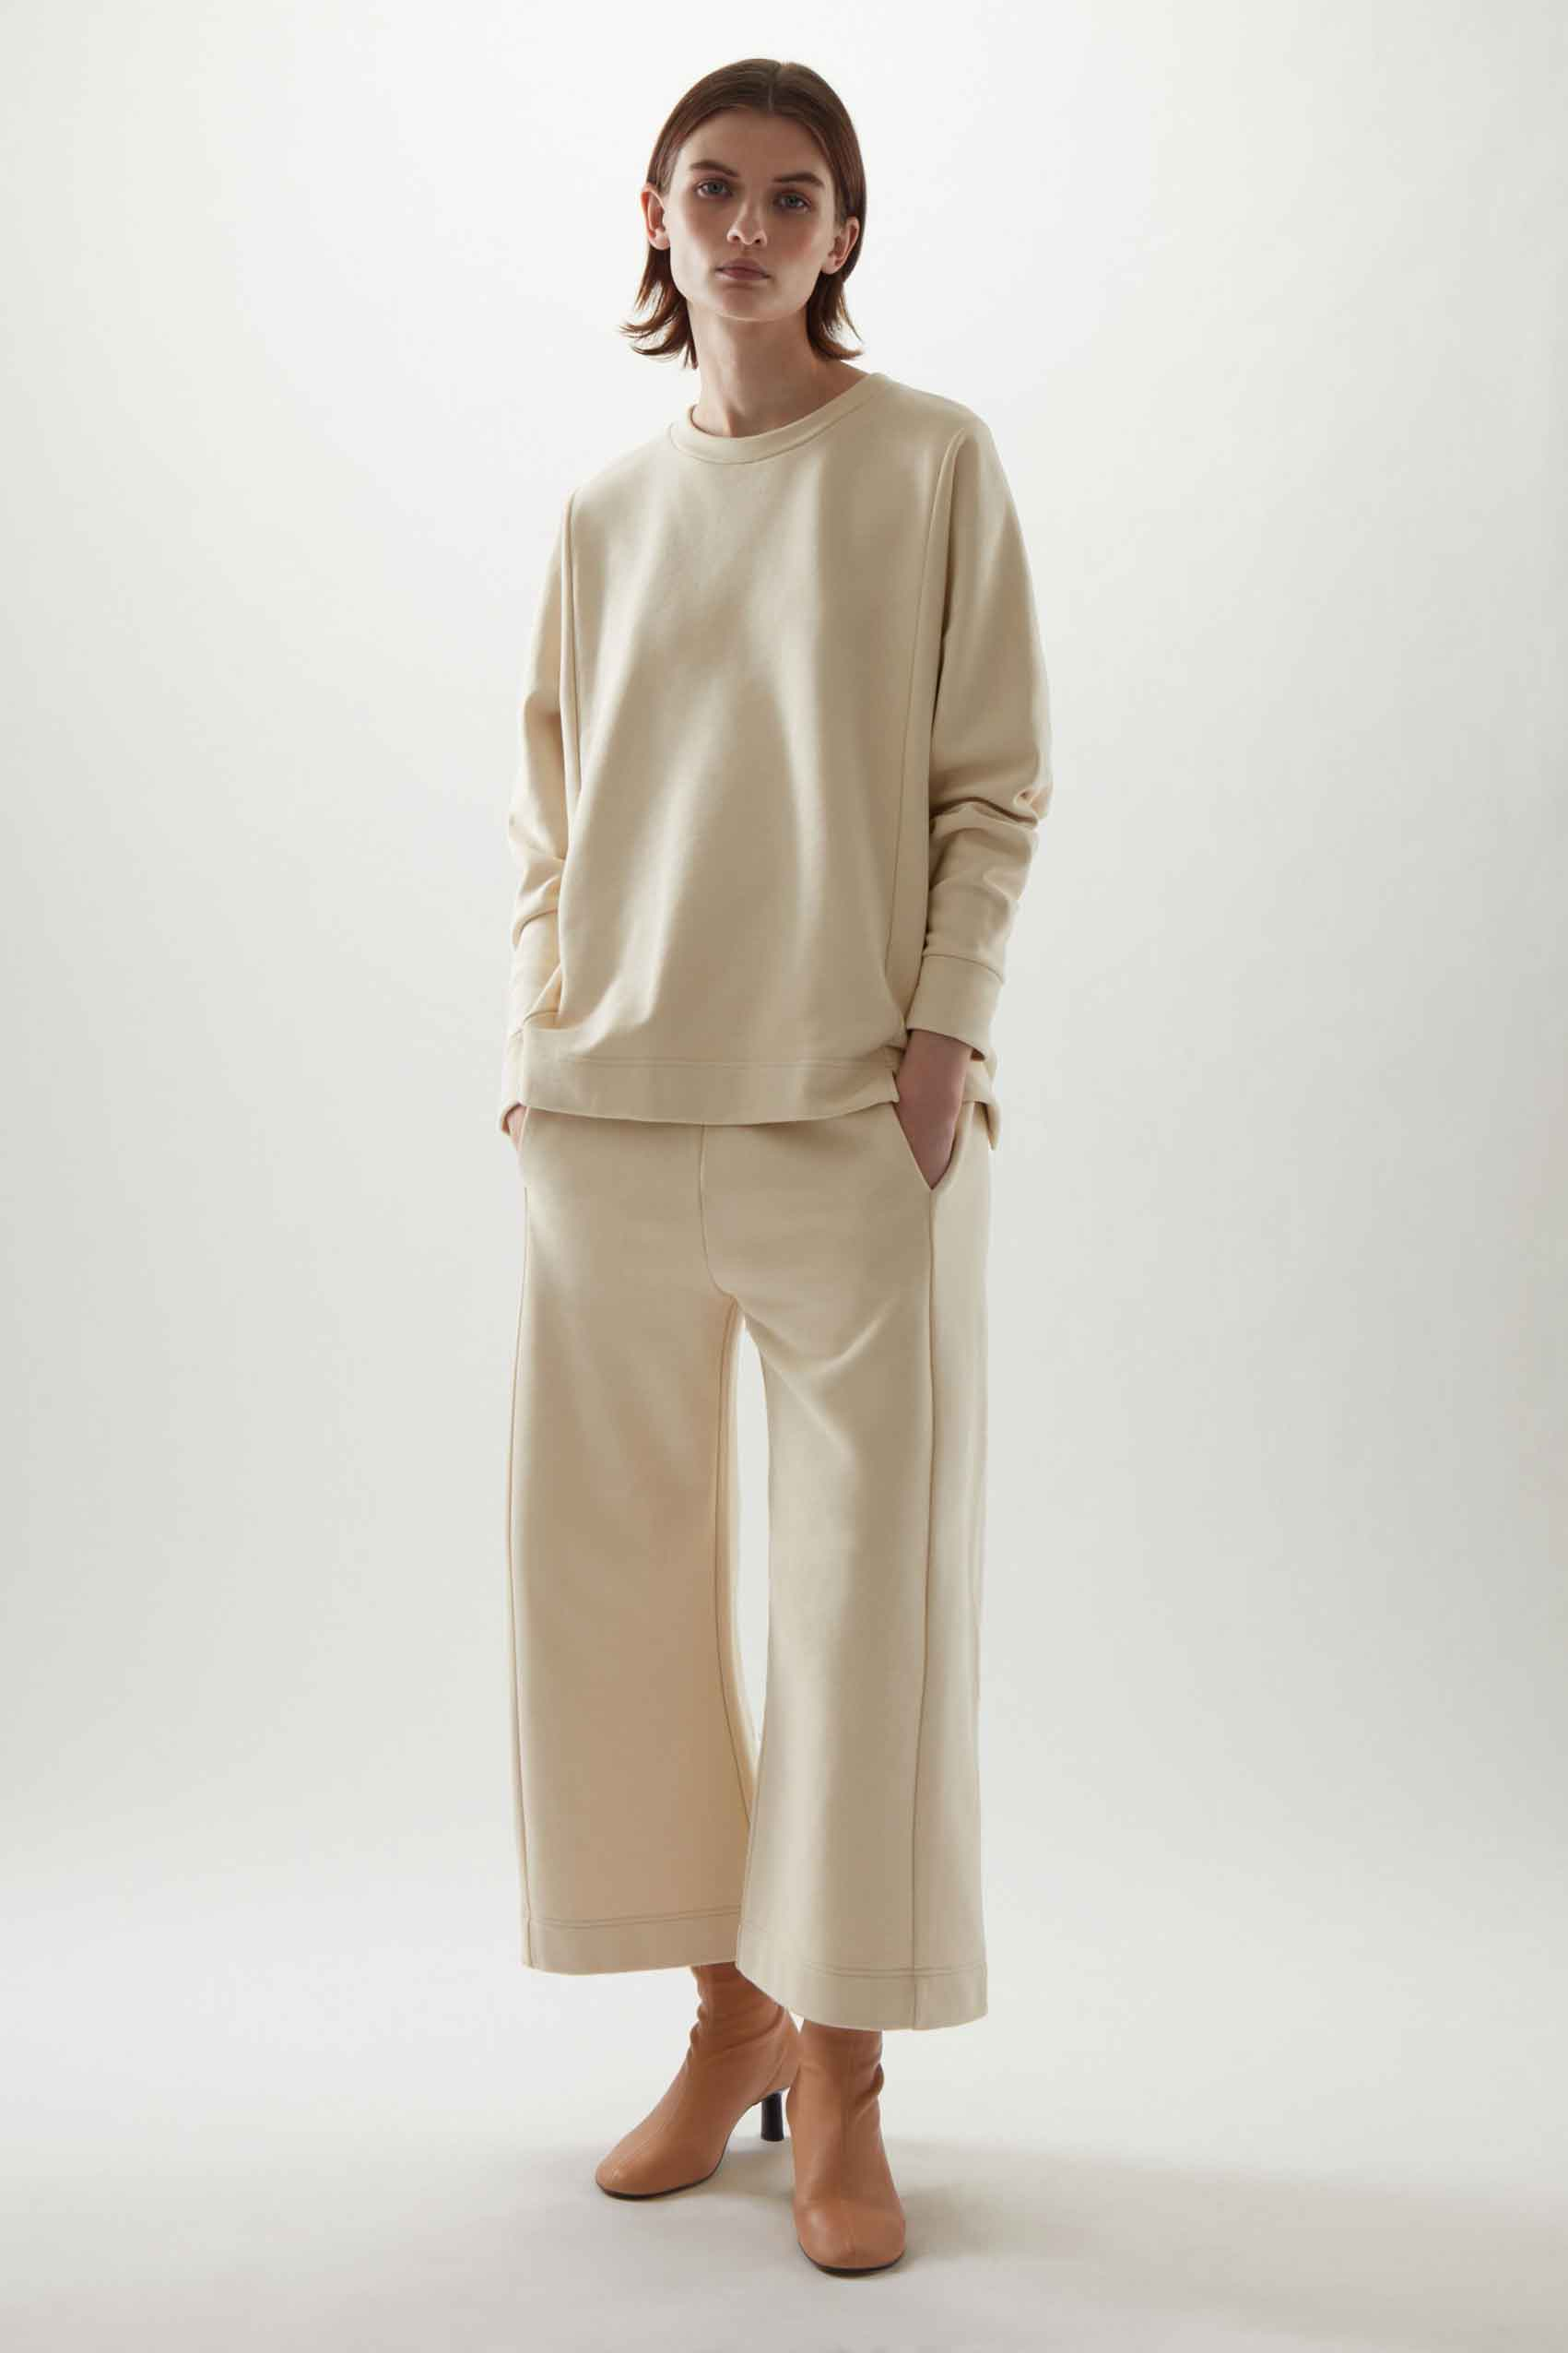 COS. חולצה: 295 שקל, מכנסיים 355 שקל. צילום: יח״צ COS